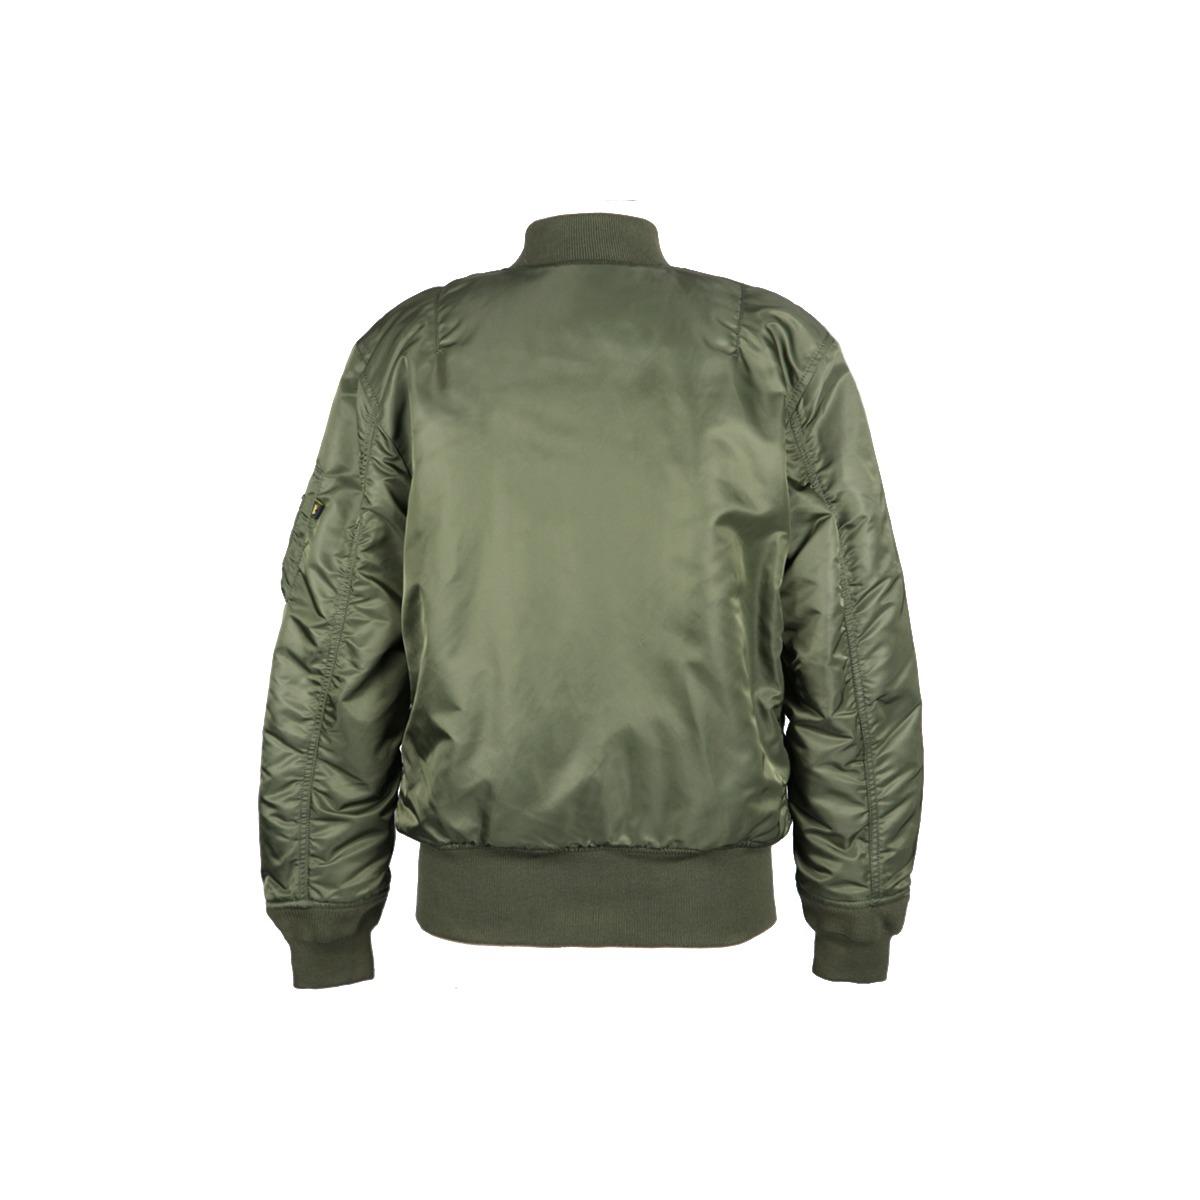 fb5c0153a53 MA-1 Nylon Flight Jacket - Sage Green for Women - MyPilotStore.com